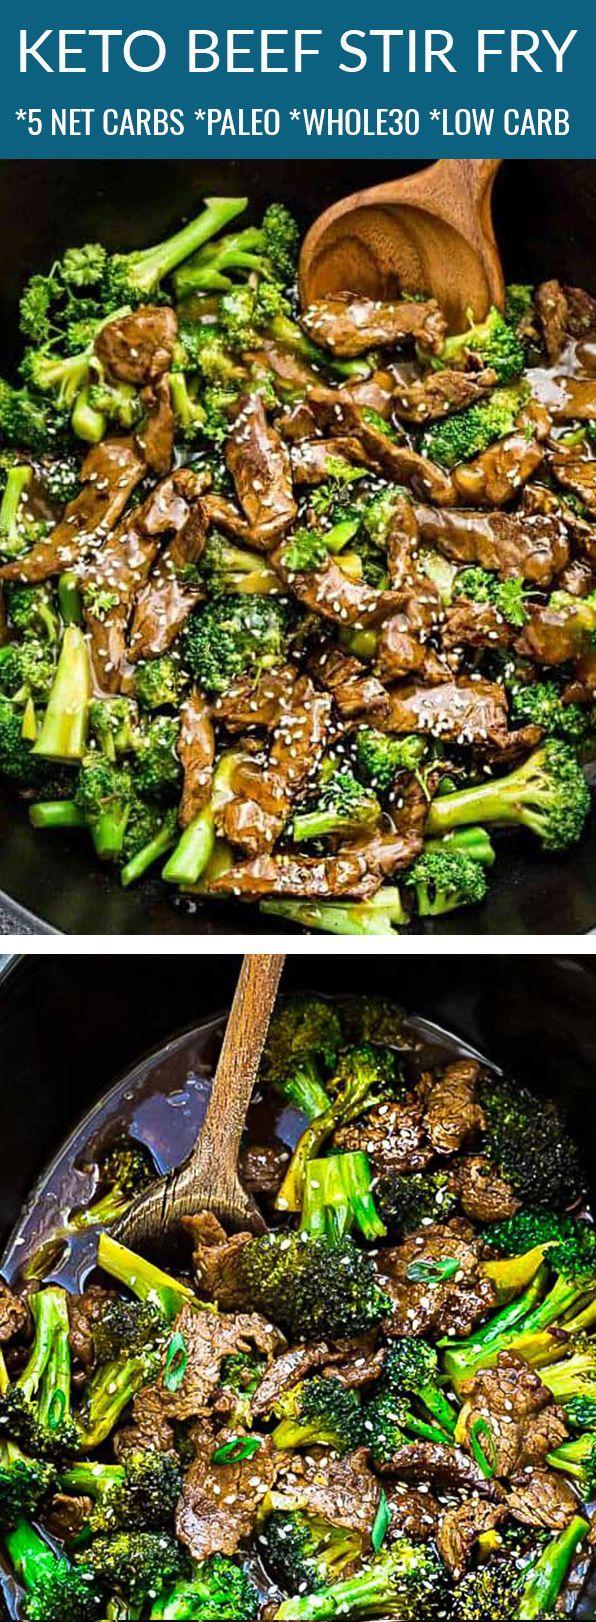 Beef Stir-Fry Recipe   Easy 20 Minute Stir-Fry Dinner Idea